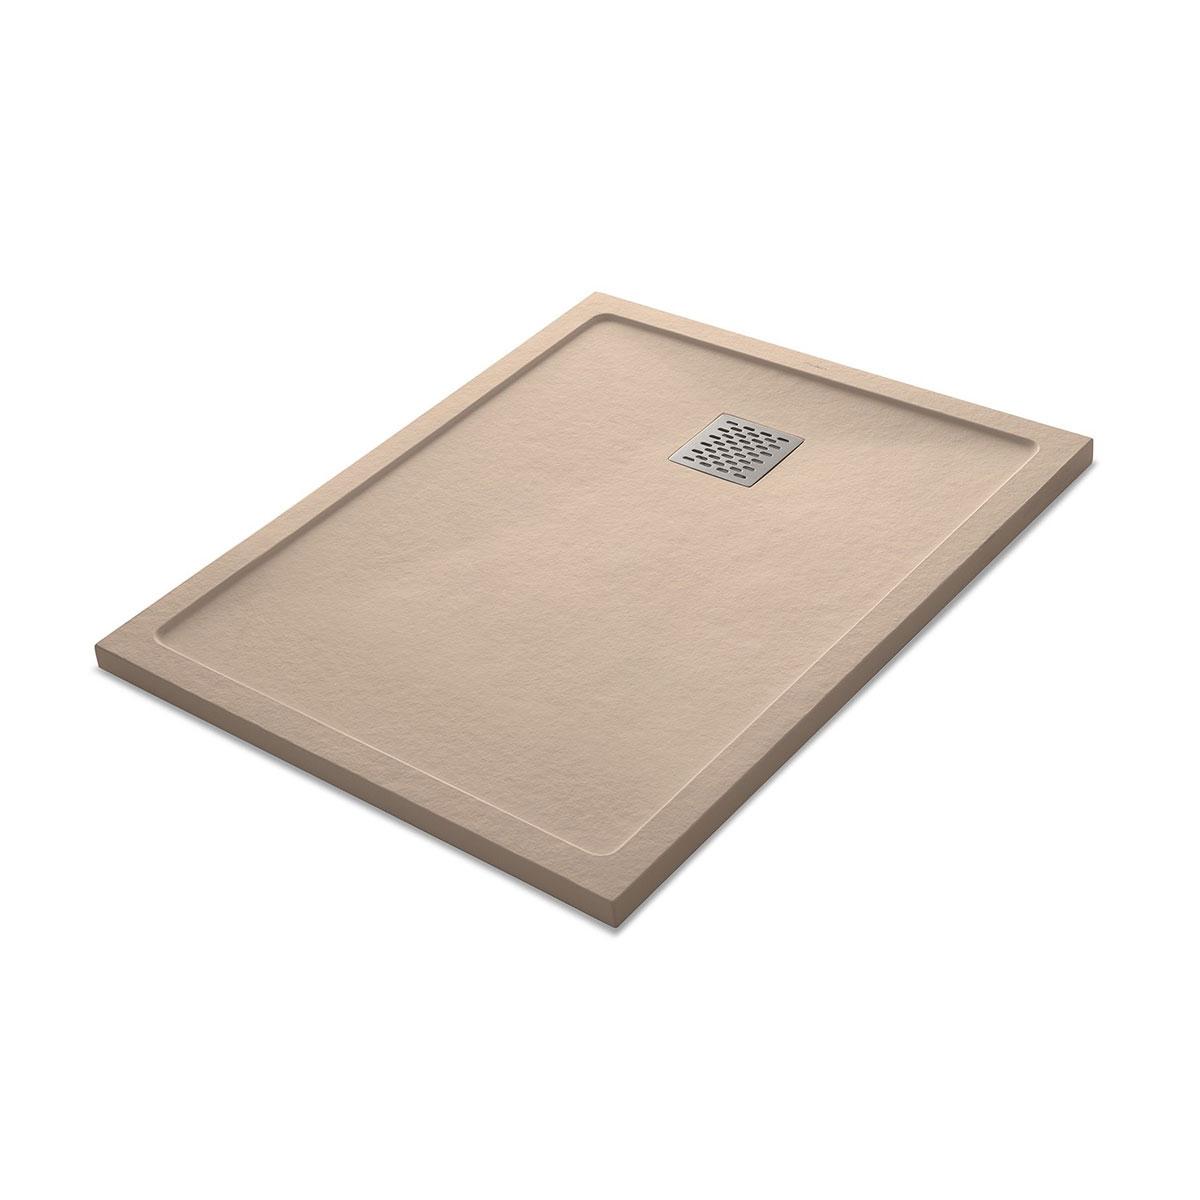 Plato de ducha rectangular 100x80 Ares Stone Nox Cappuccino